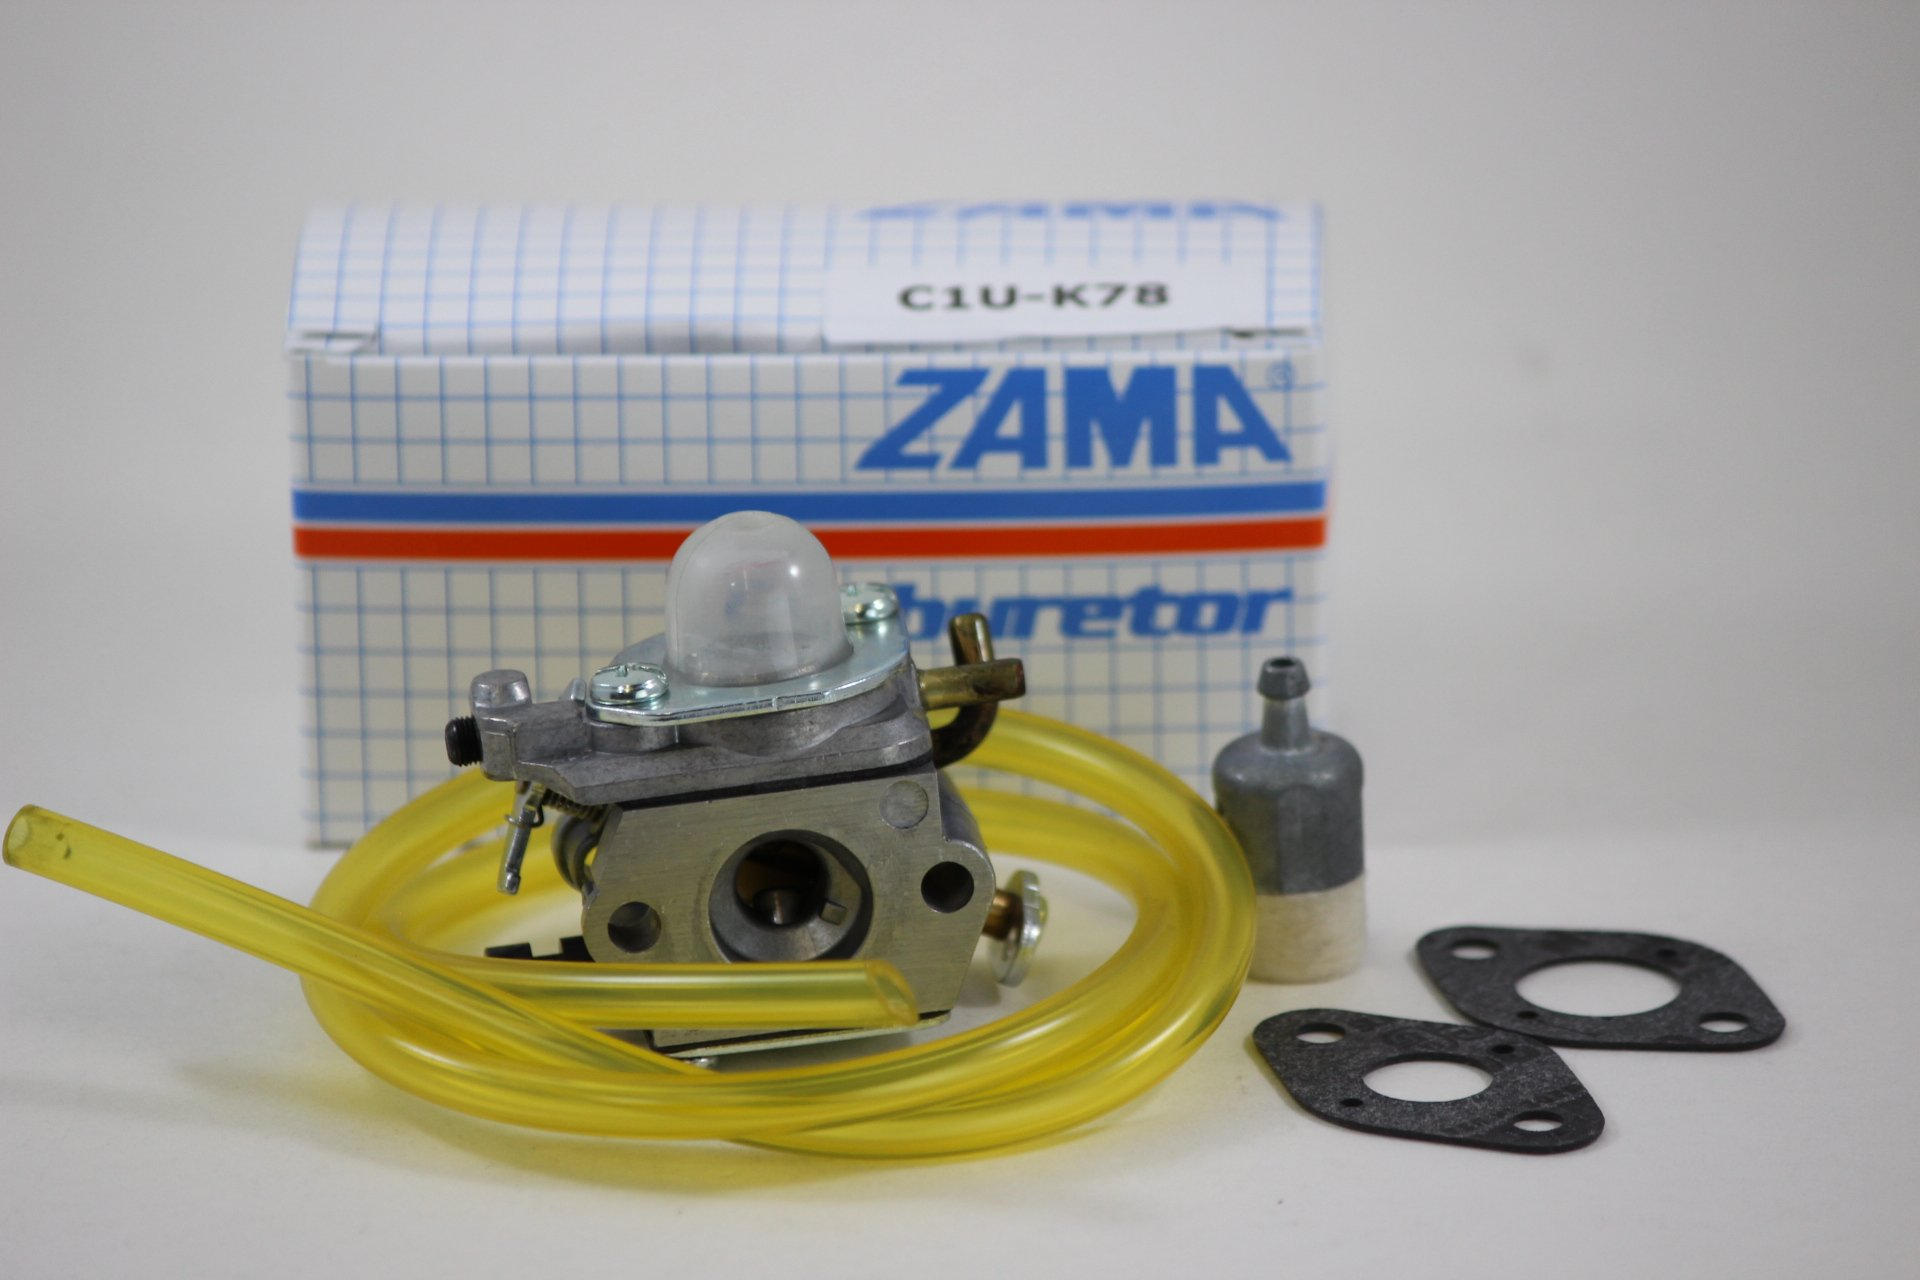 OEM Zama CARBURETOR Carb C1U-K78 Echo PB200 PB-200 PB201 PB-201 Power Blowers COMBO!